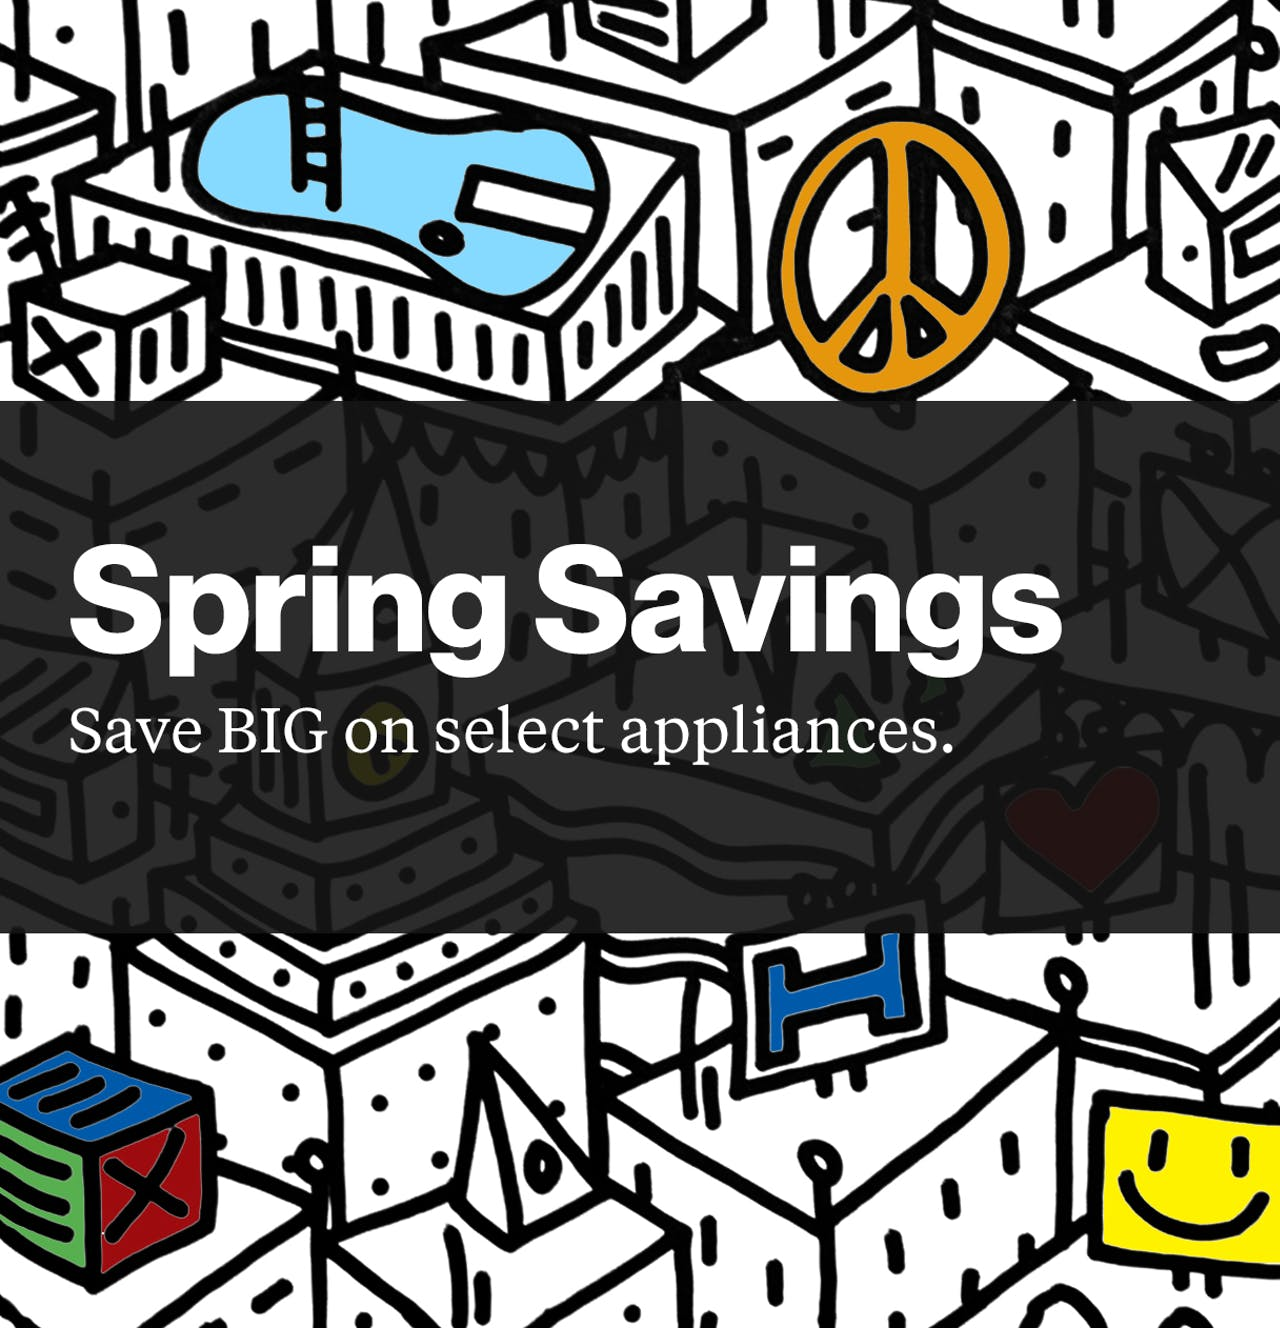 Spring Savings Sale - Save big on select Haier appliances.